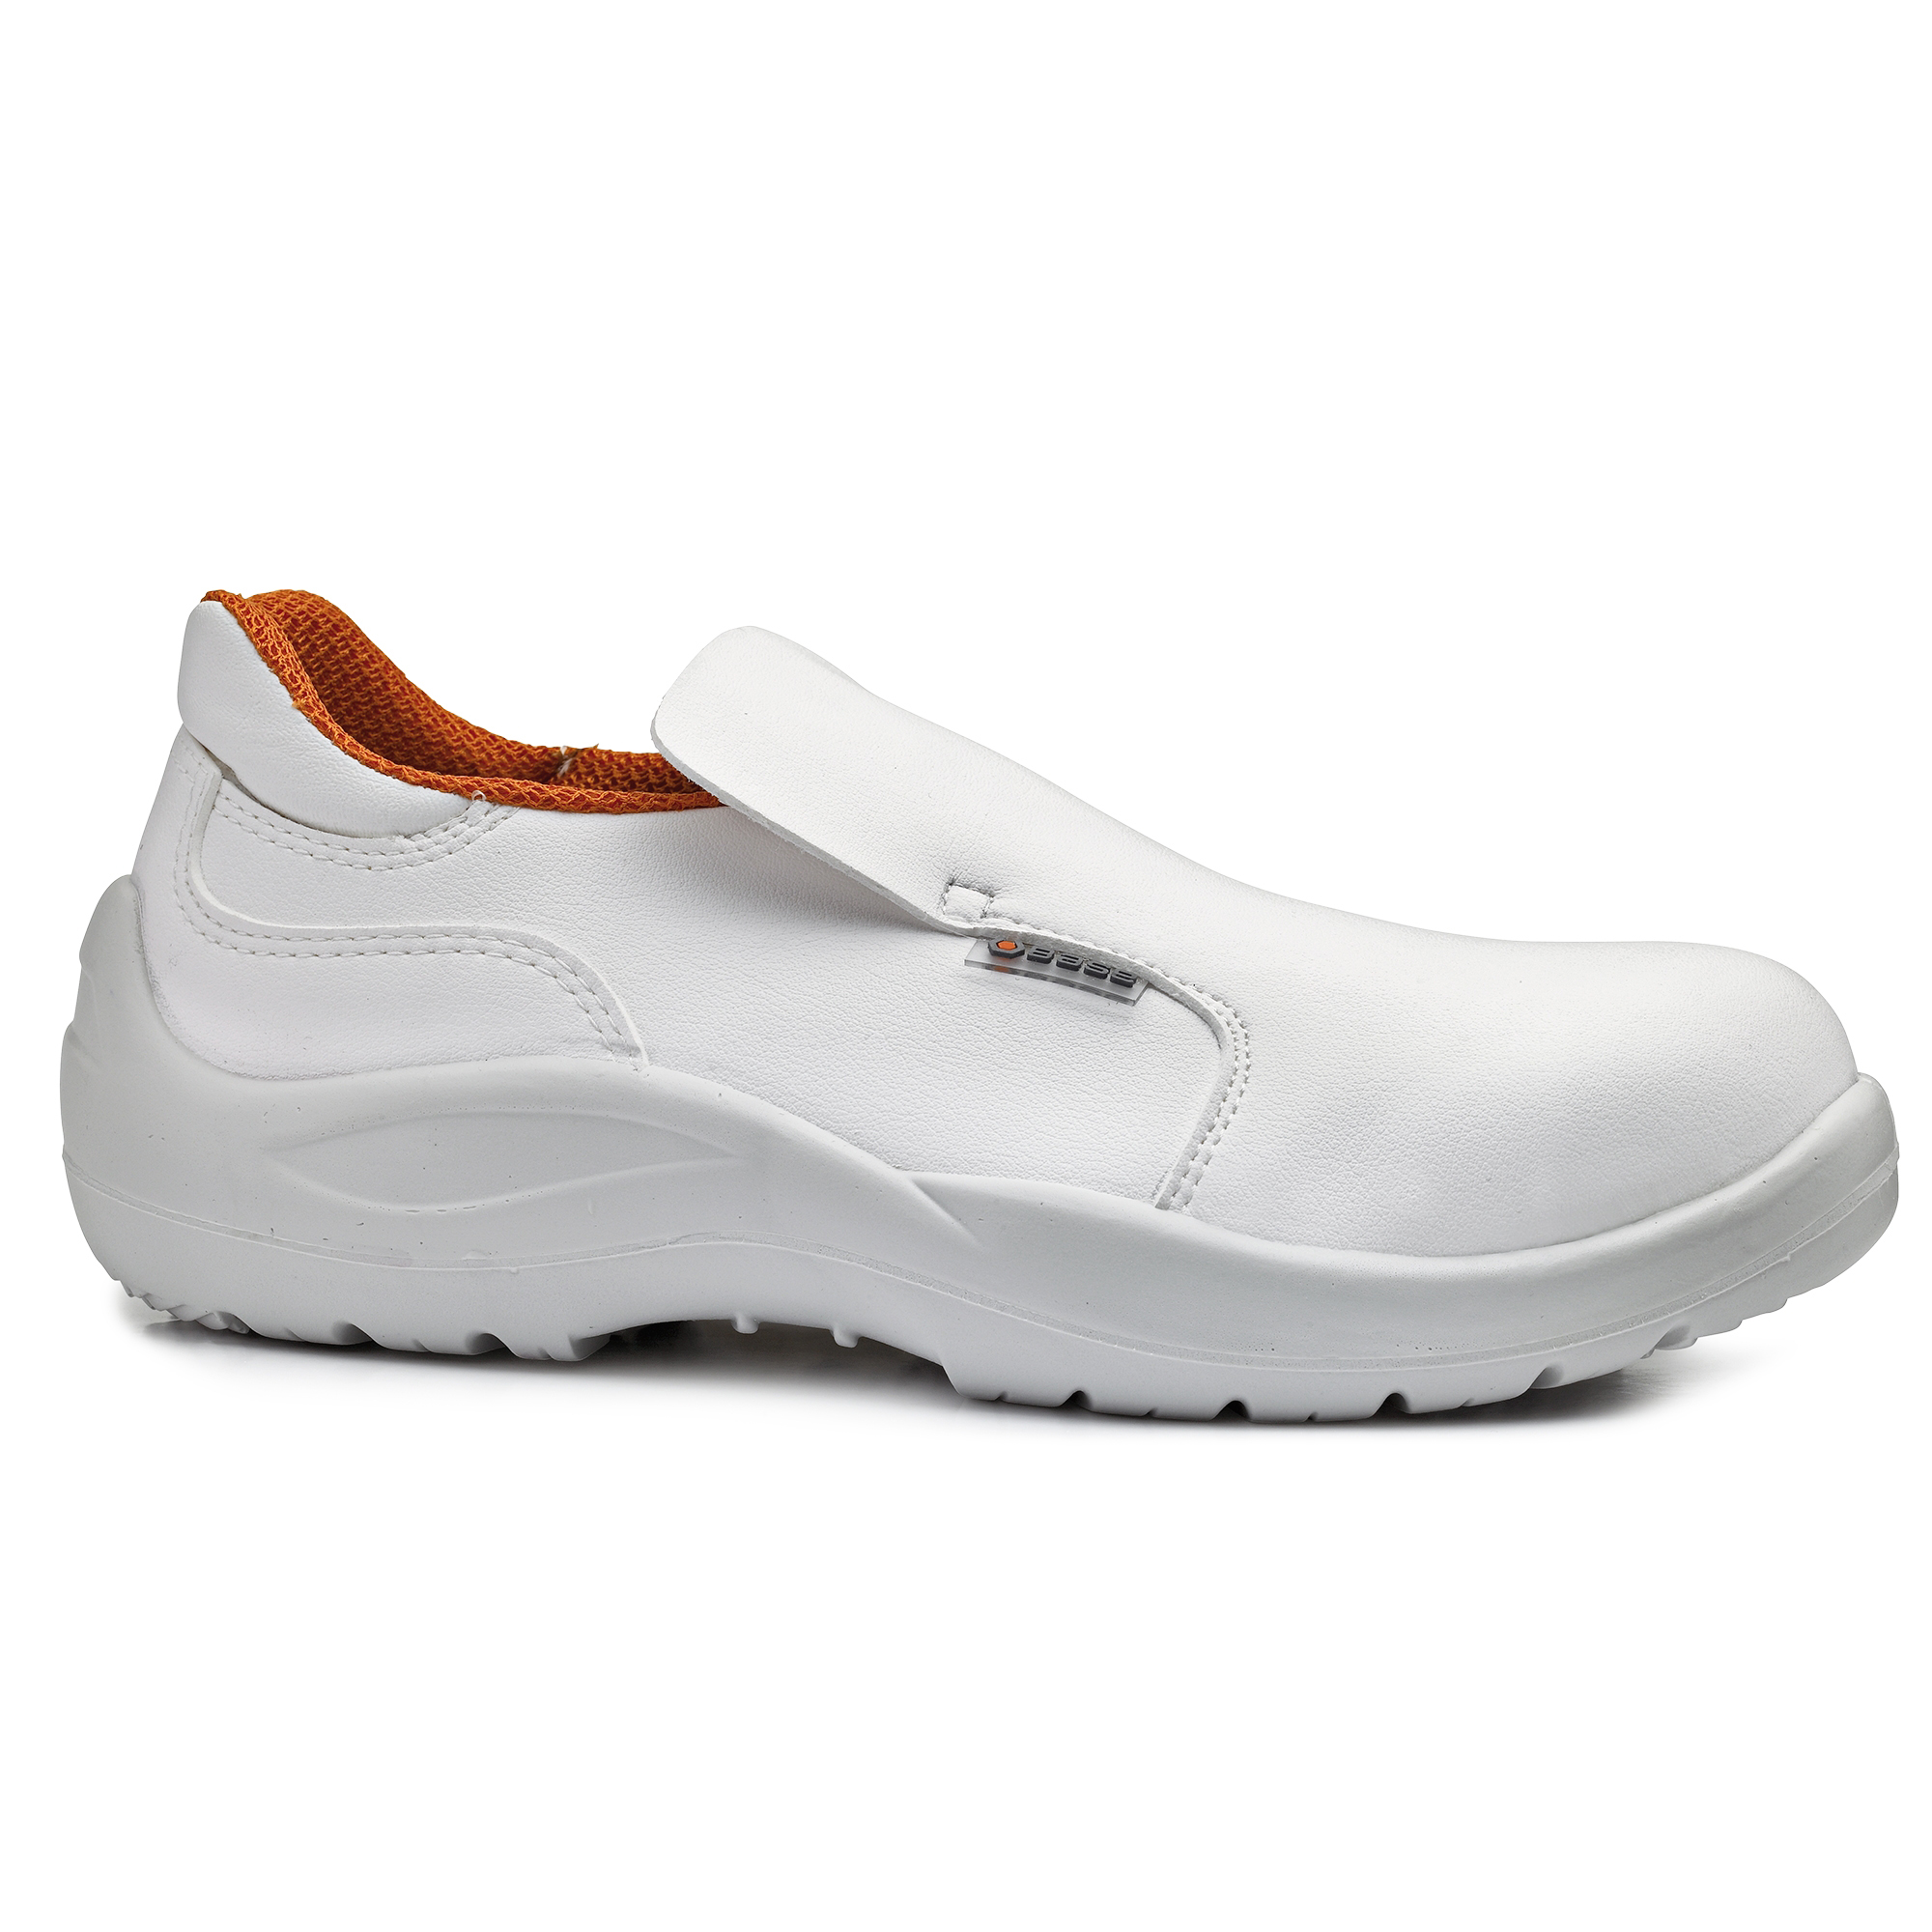 białe buty base cloro